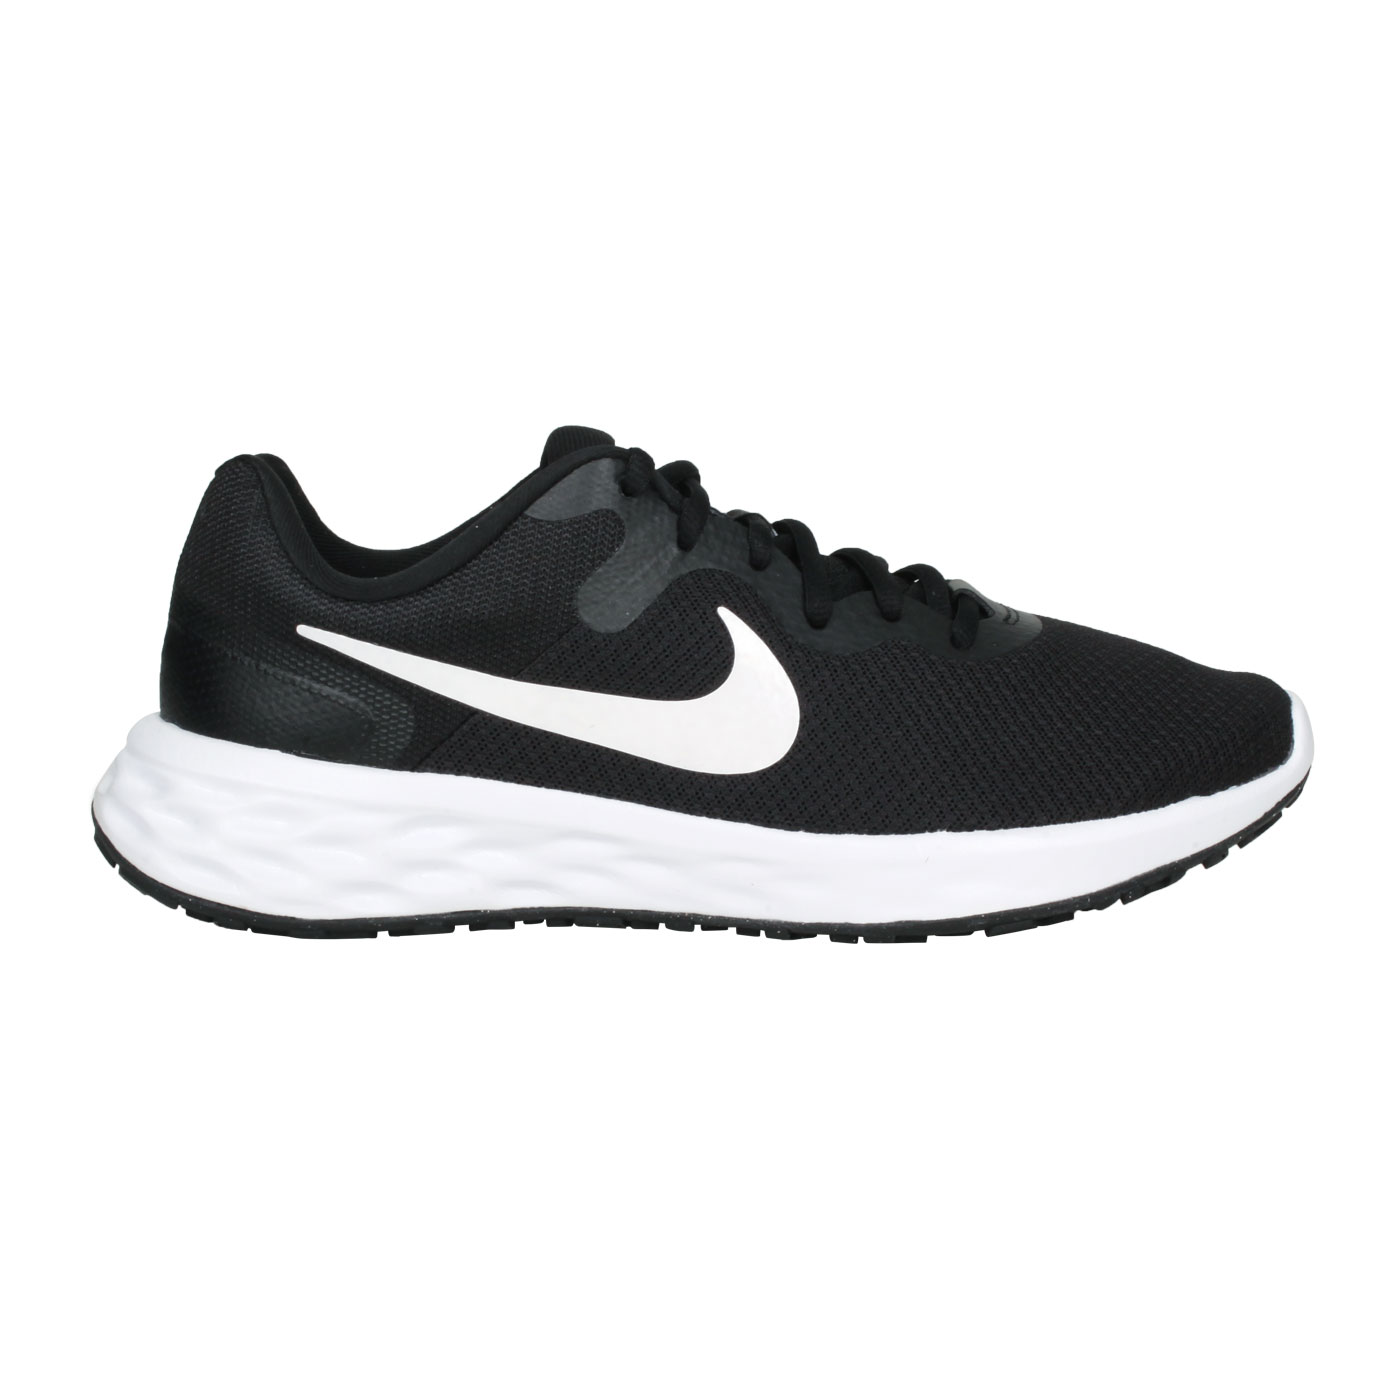 NIKE 男款慢跑鞋   @REVOLUTION 6 NN@DC3728-003